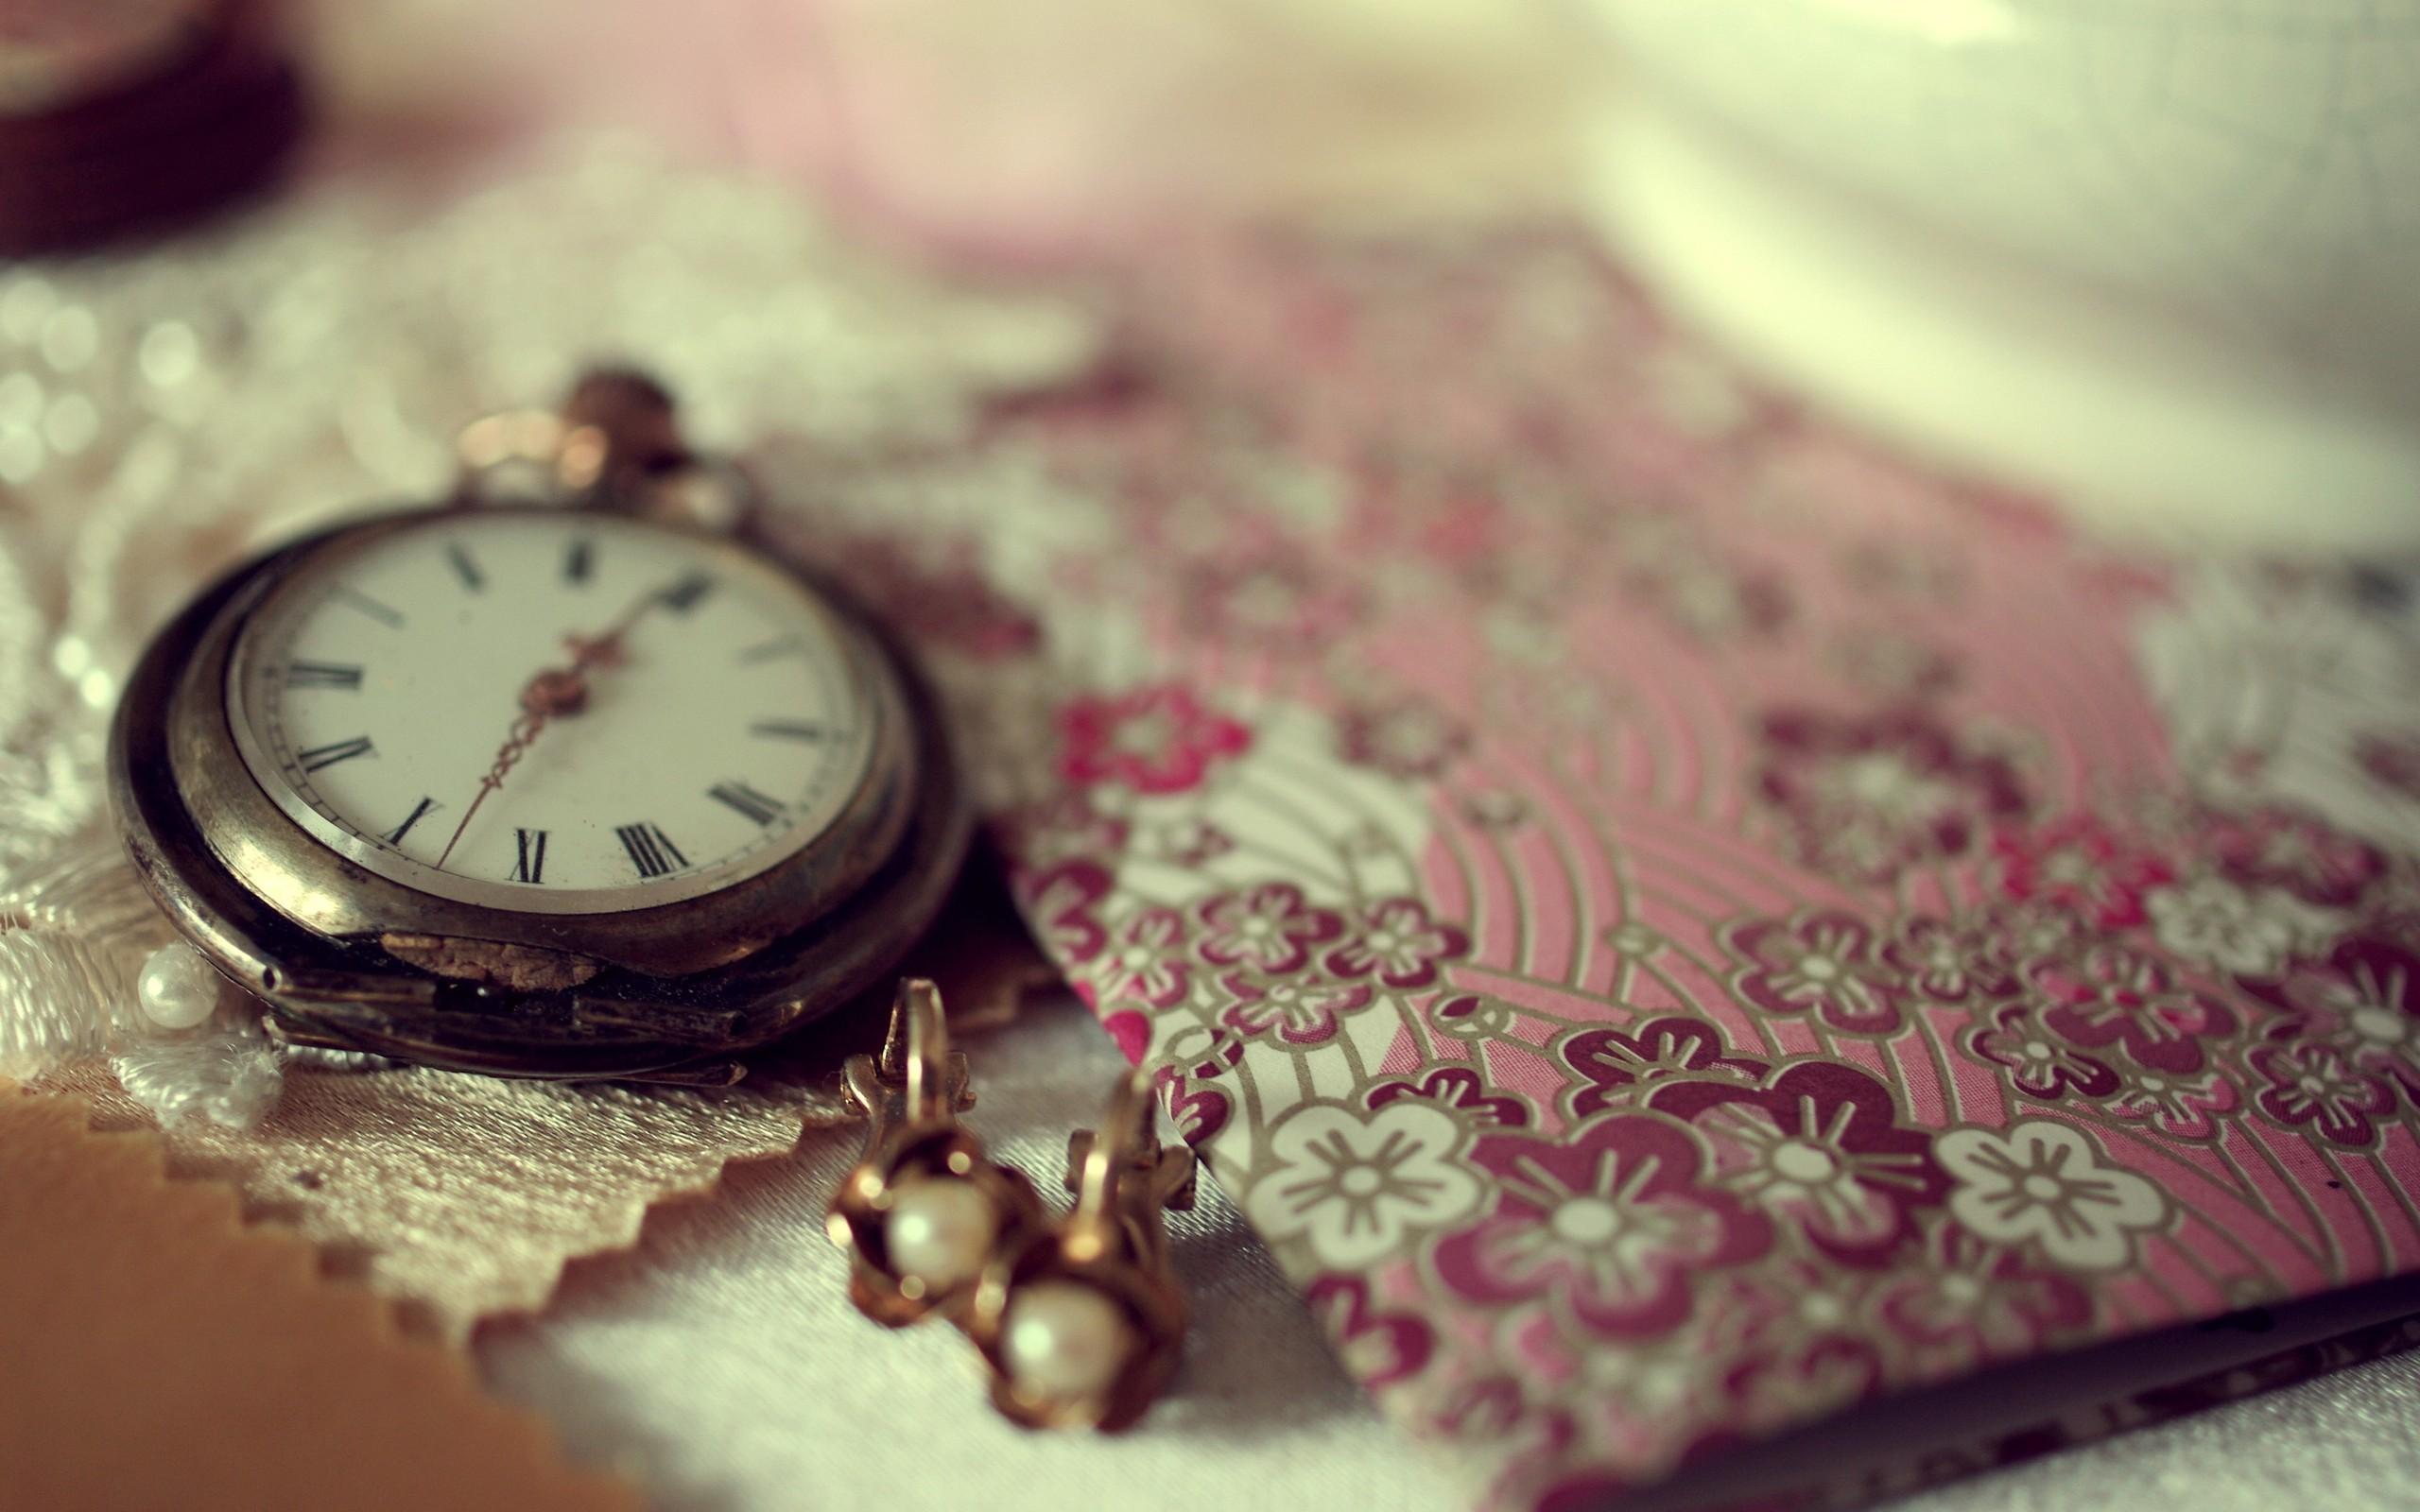 Hd, Image, Sweet, Watch, Widescreen